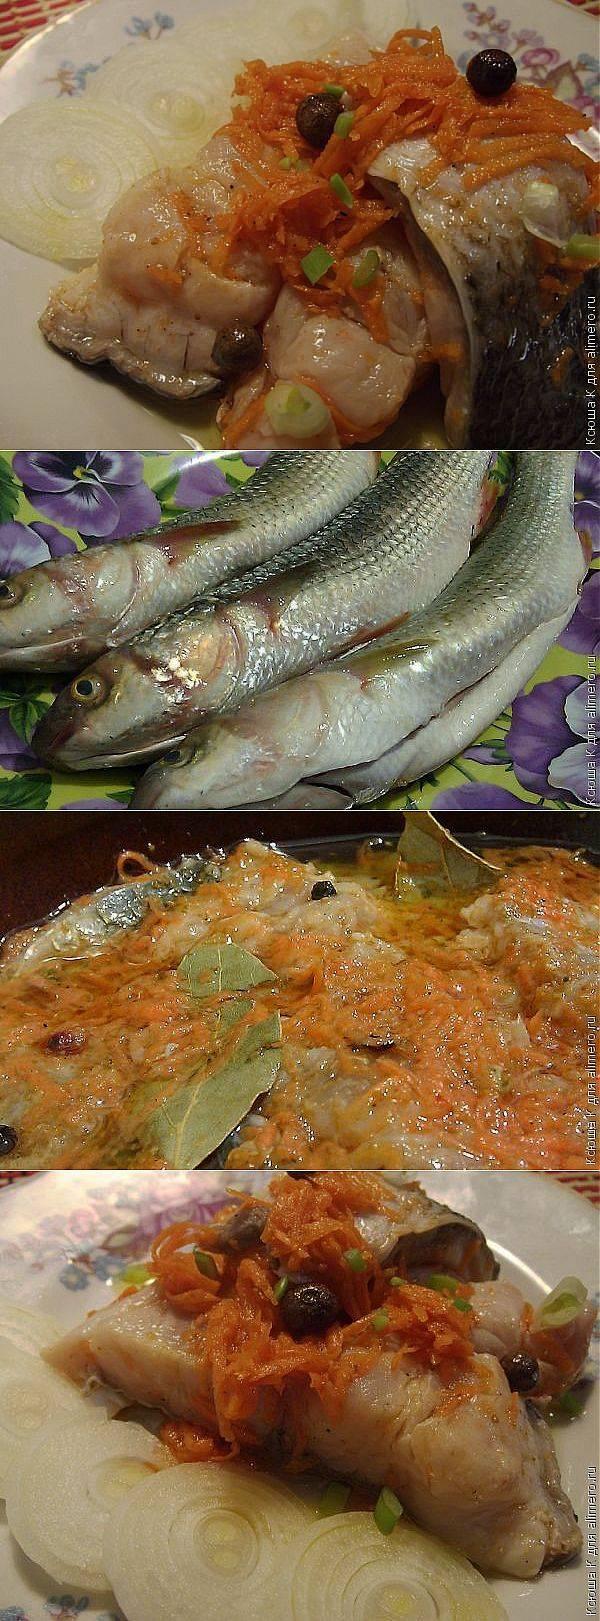 Рыба пеленгас - вкусная и нежная